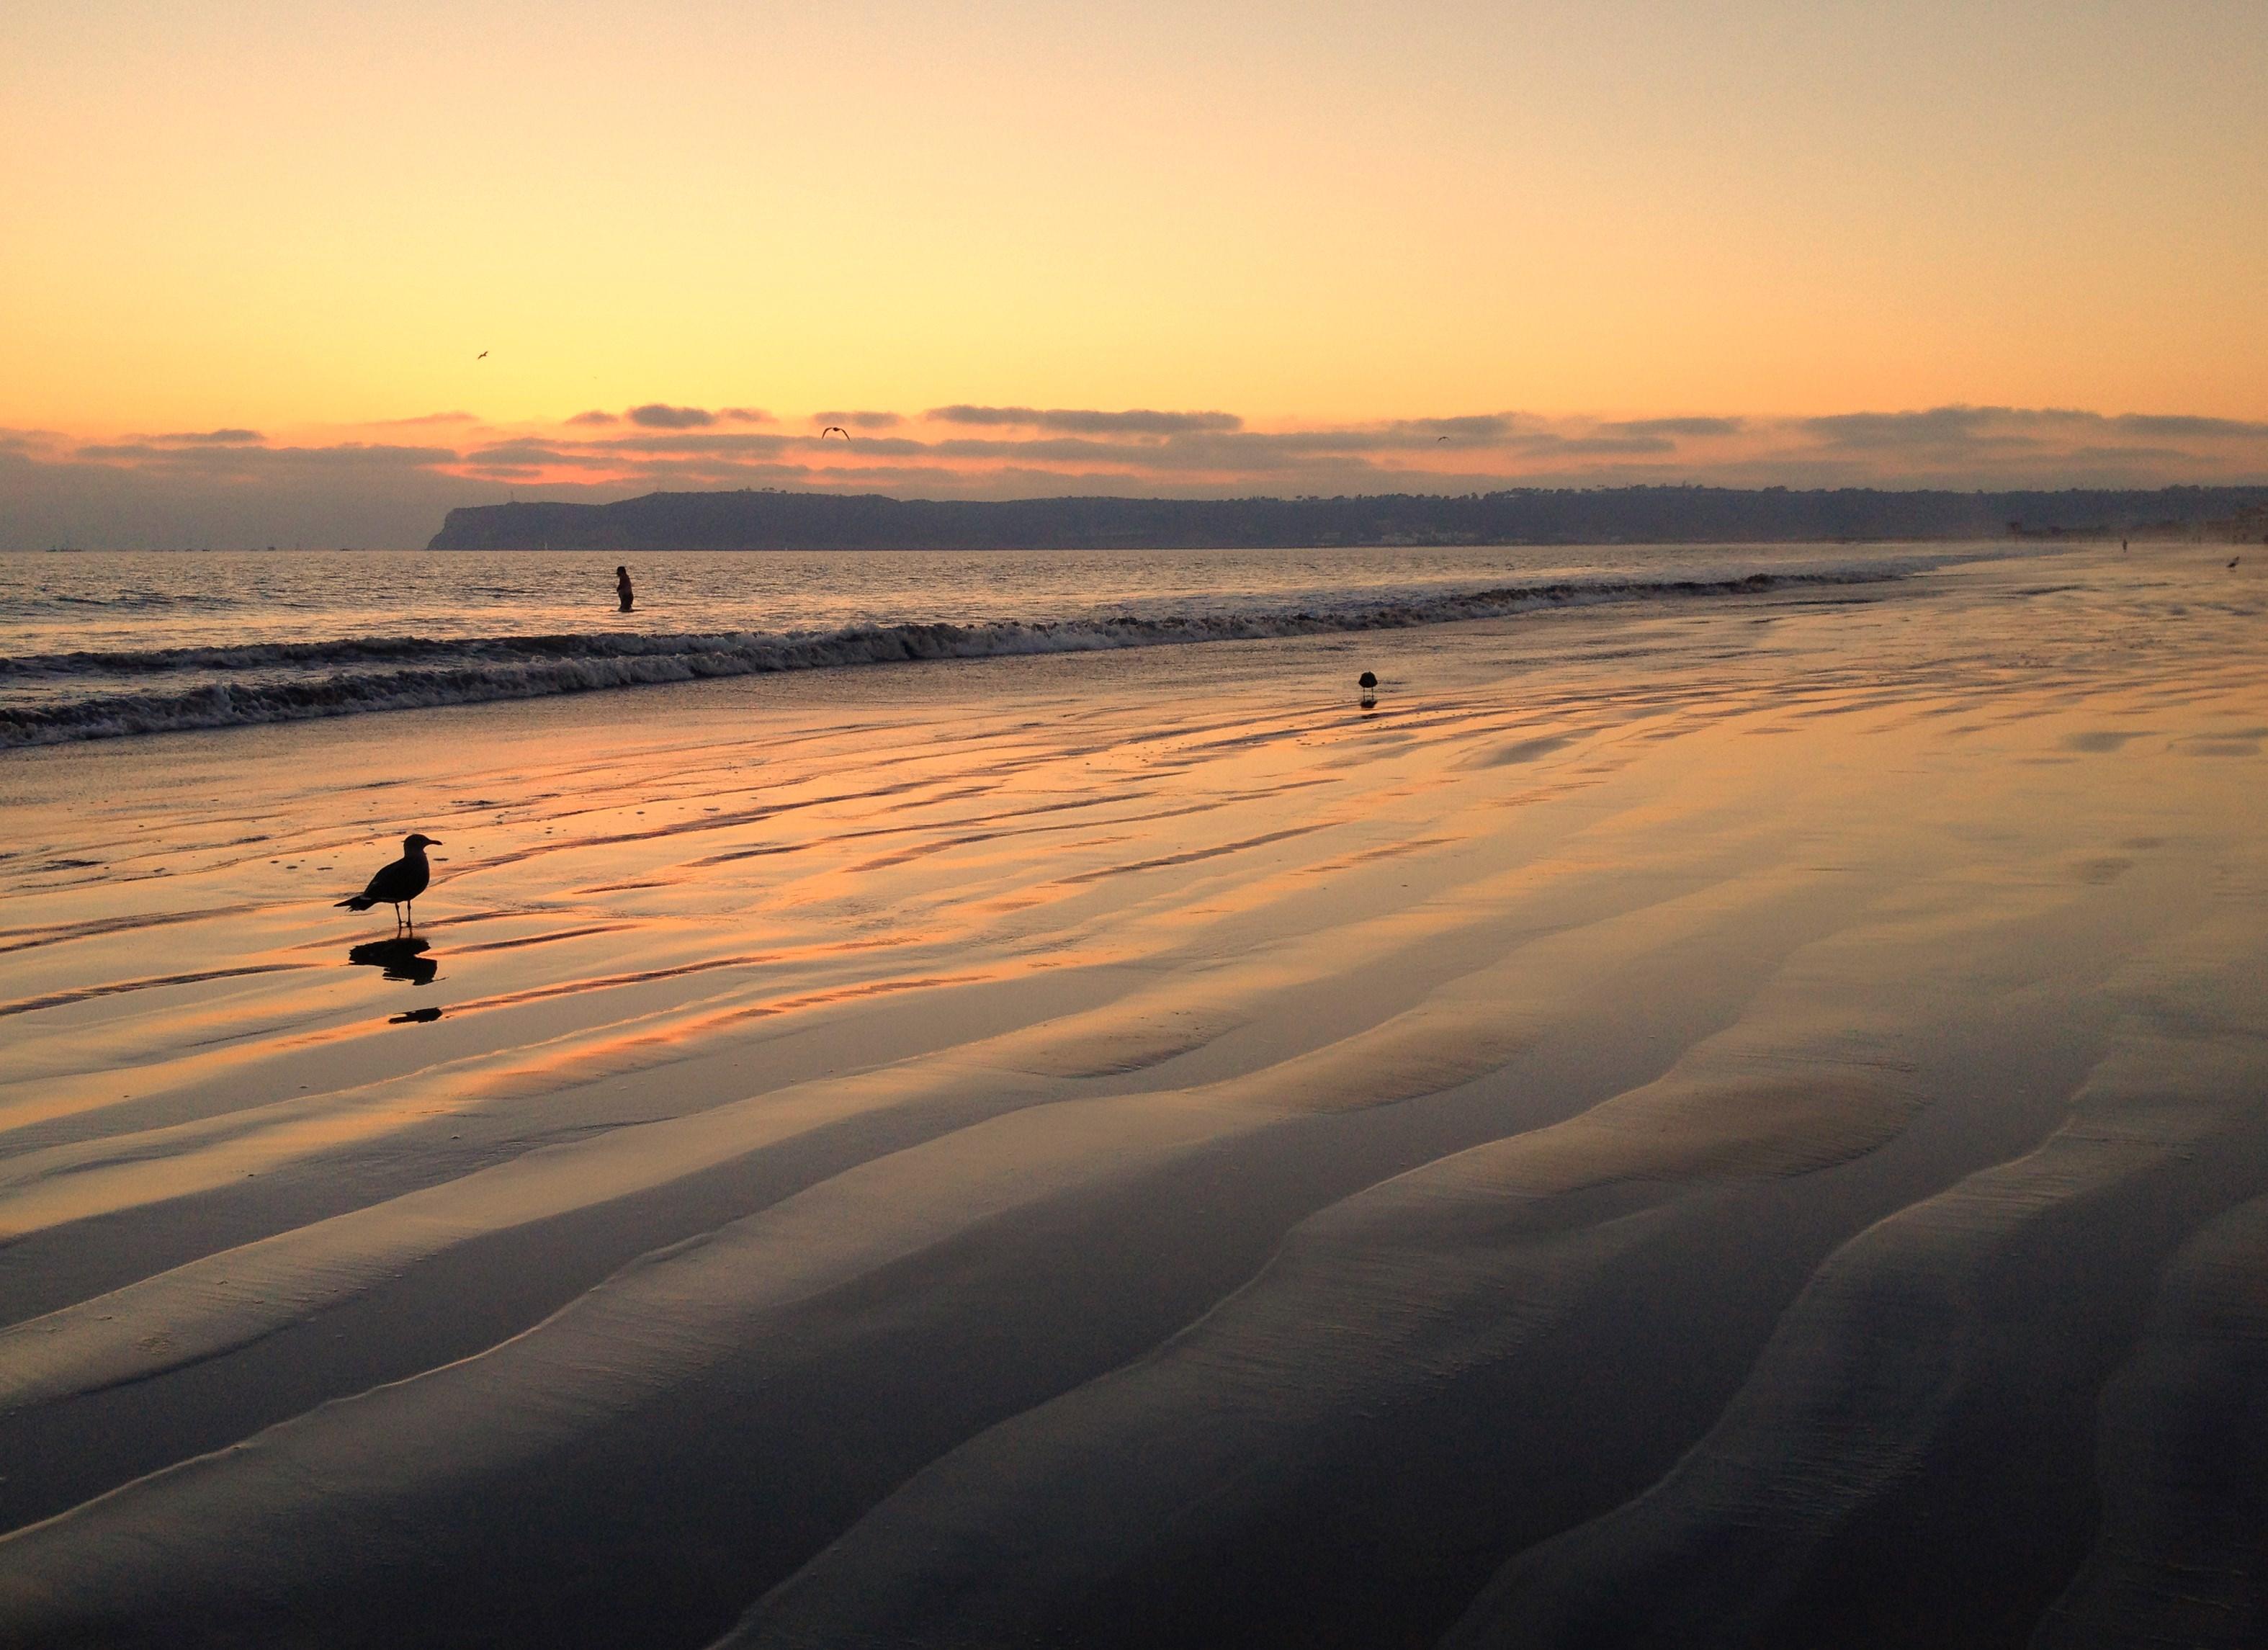 Wallpaper Ocean California Sunset Beach Island Pacific Sandiego Seagull Coronado Iphone Coronadoisland Coronadobeach 3149x2291 978102 Hd Wallpapers Wallhere